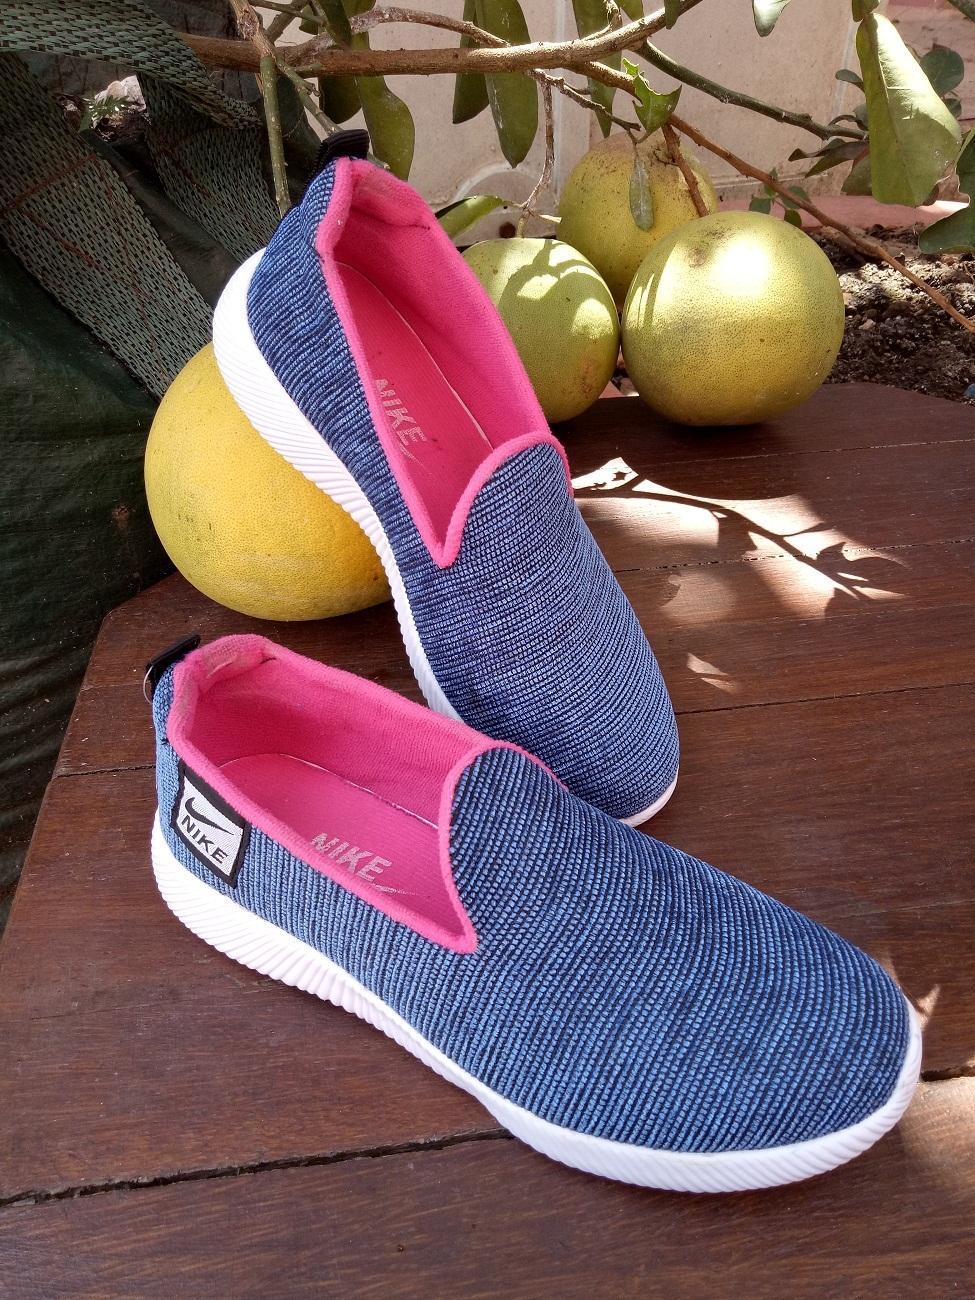 Sepatu pria wanita / sepatu casual murah / sepatu sport promo / sepatu kekinian / sepatu original nike adidas / sepatu terbaru termurah / sepatu terlaris / sepatu terkini / sepatu sneakers slip on / sepatu murah premium original / hv02bluepink